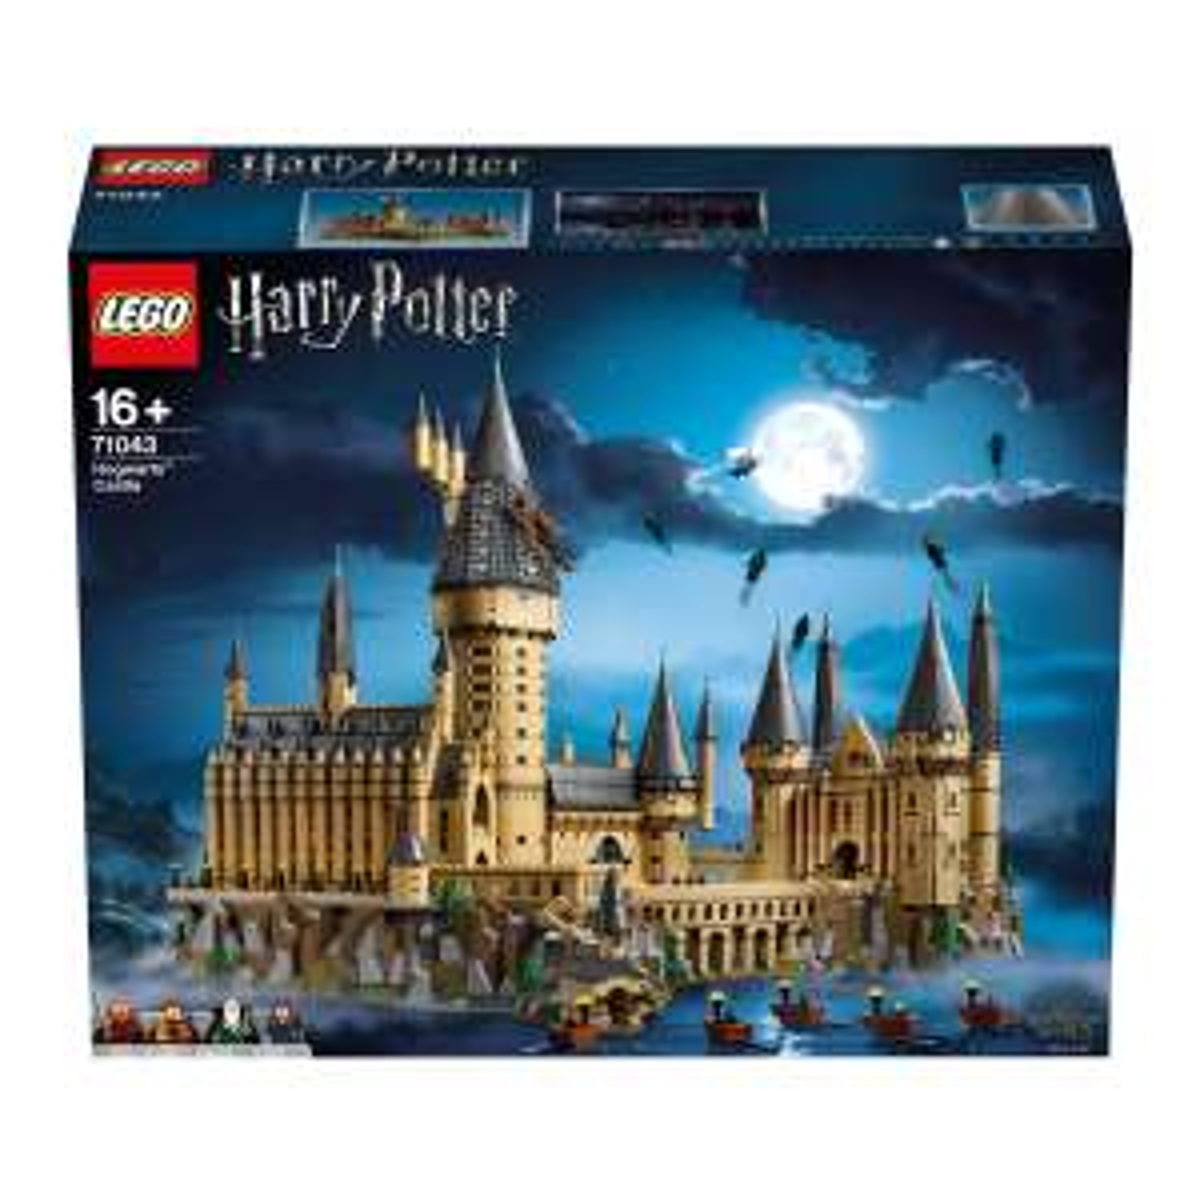 LEGO Hogwarts Castle - £307 @ El Corte Ingles